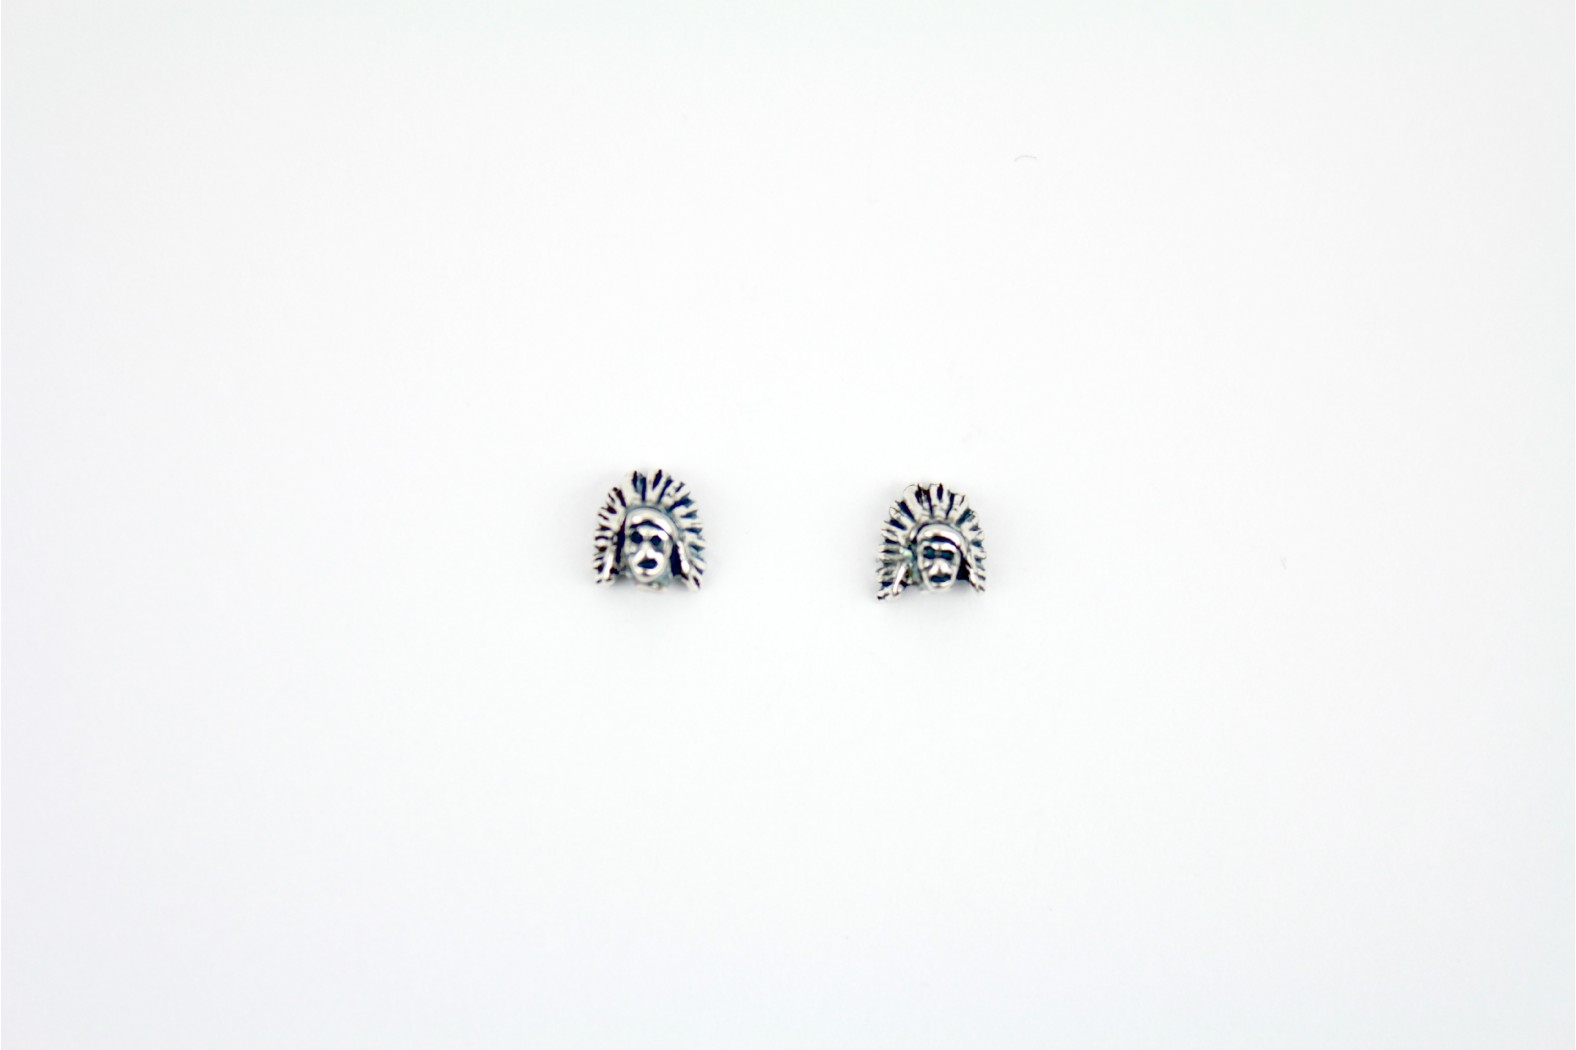 South American Indian Designe silver stud earrings